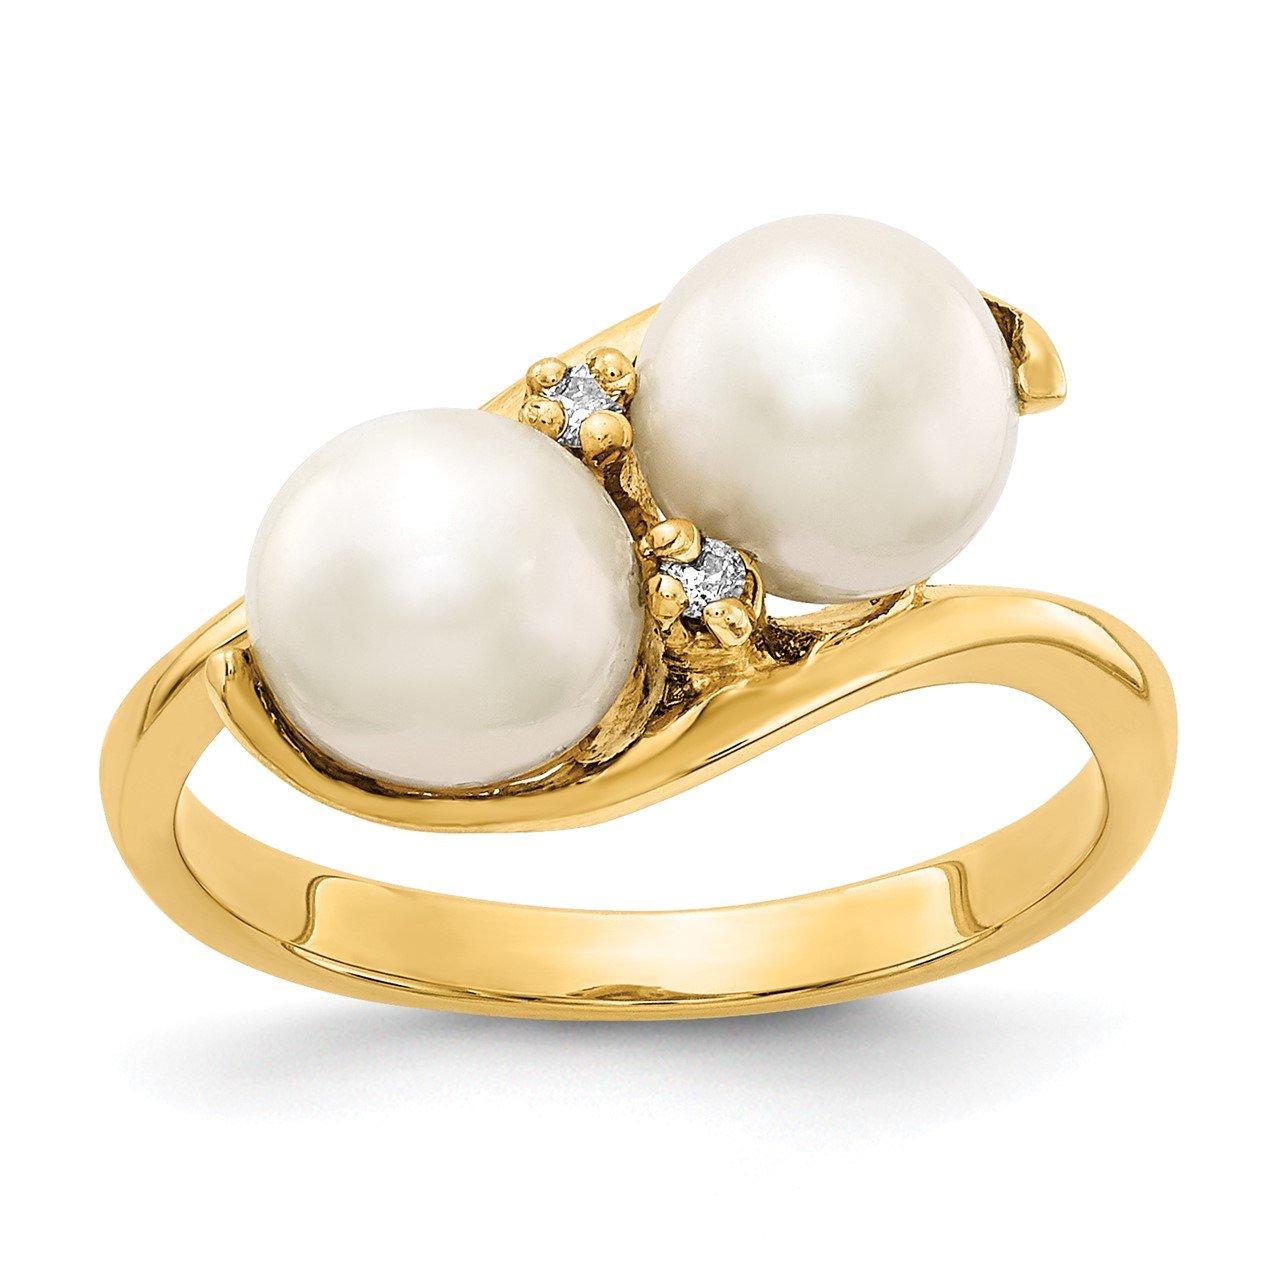 14k 6mm FW Cultured Pearl AAA Diamond ring